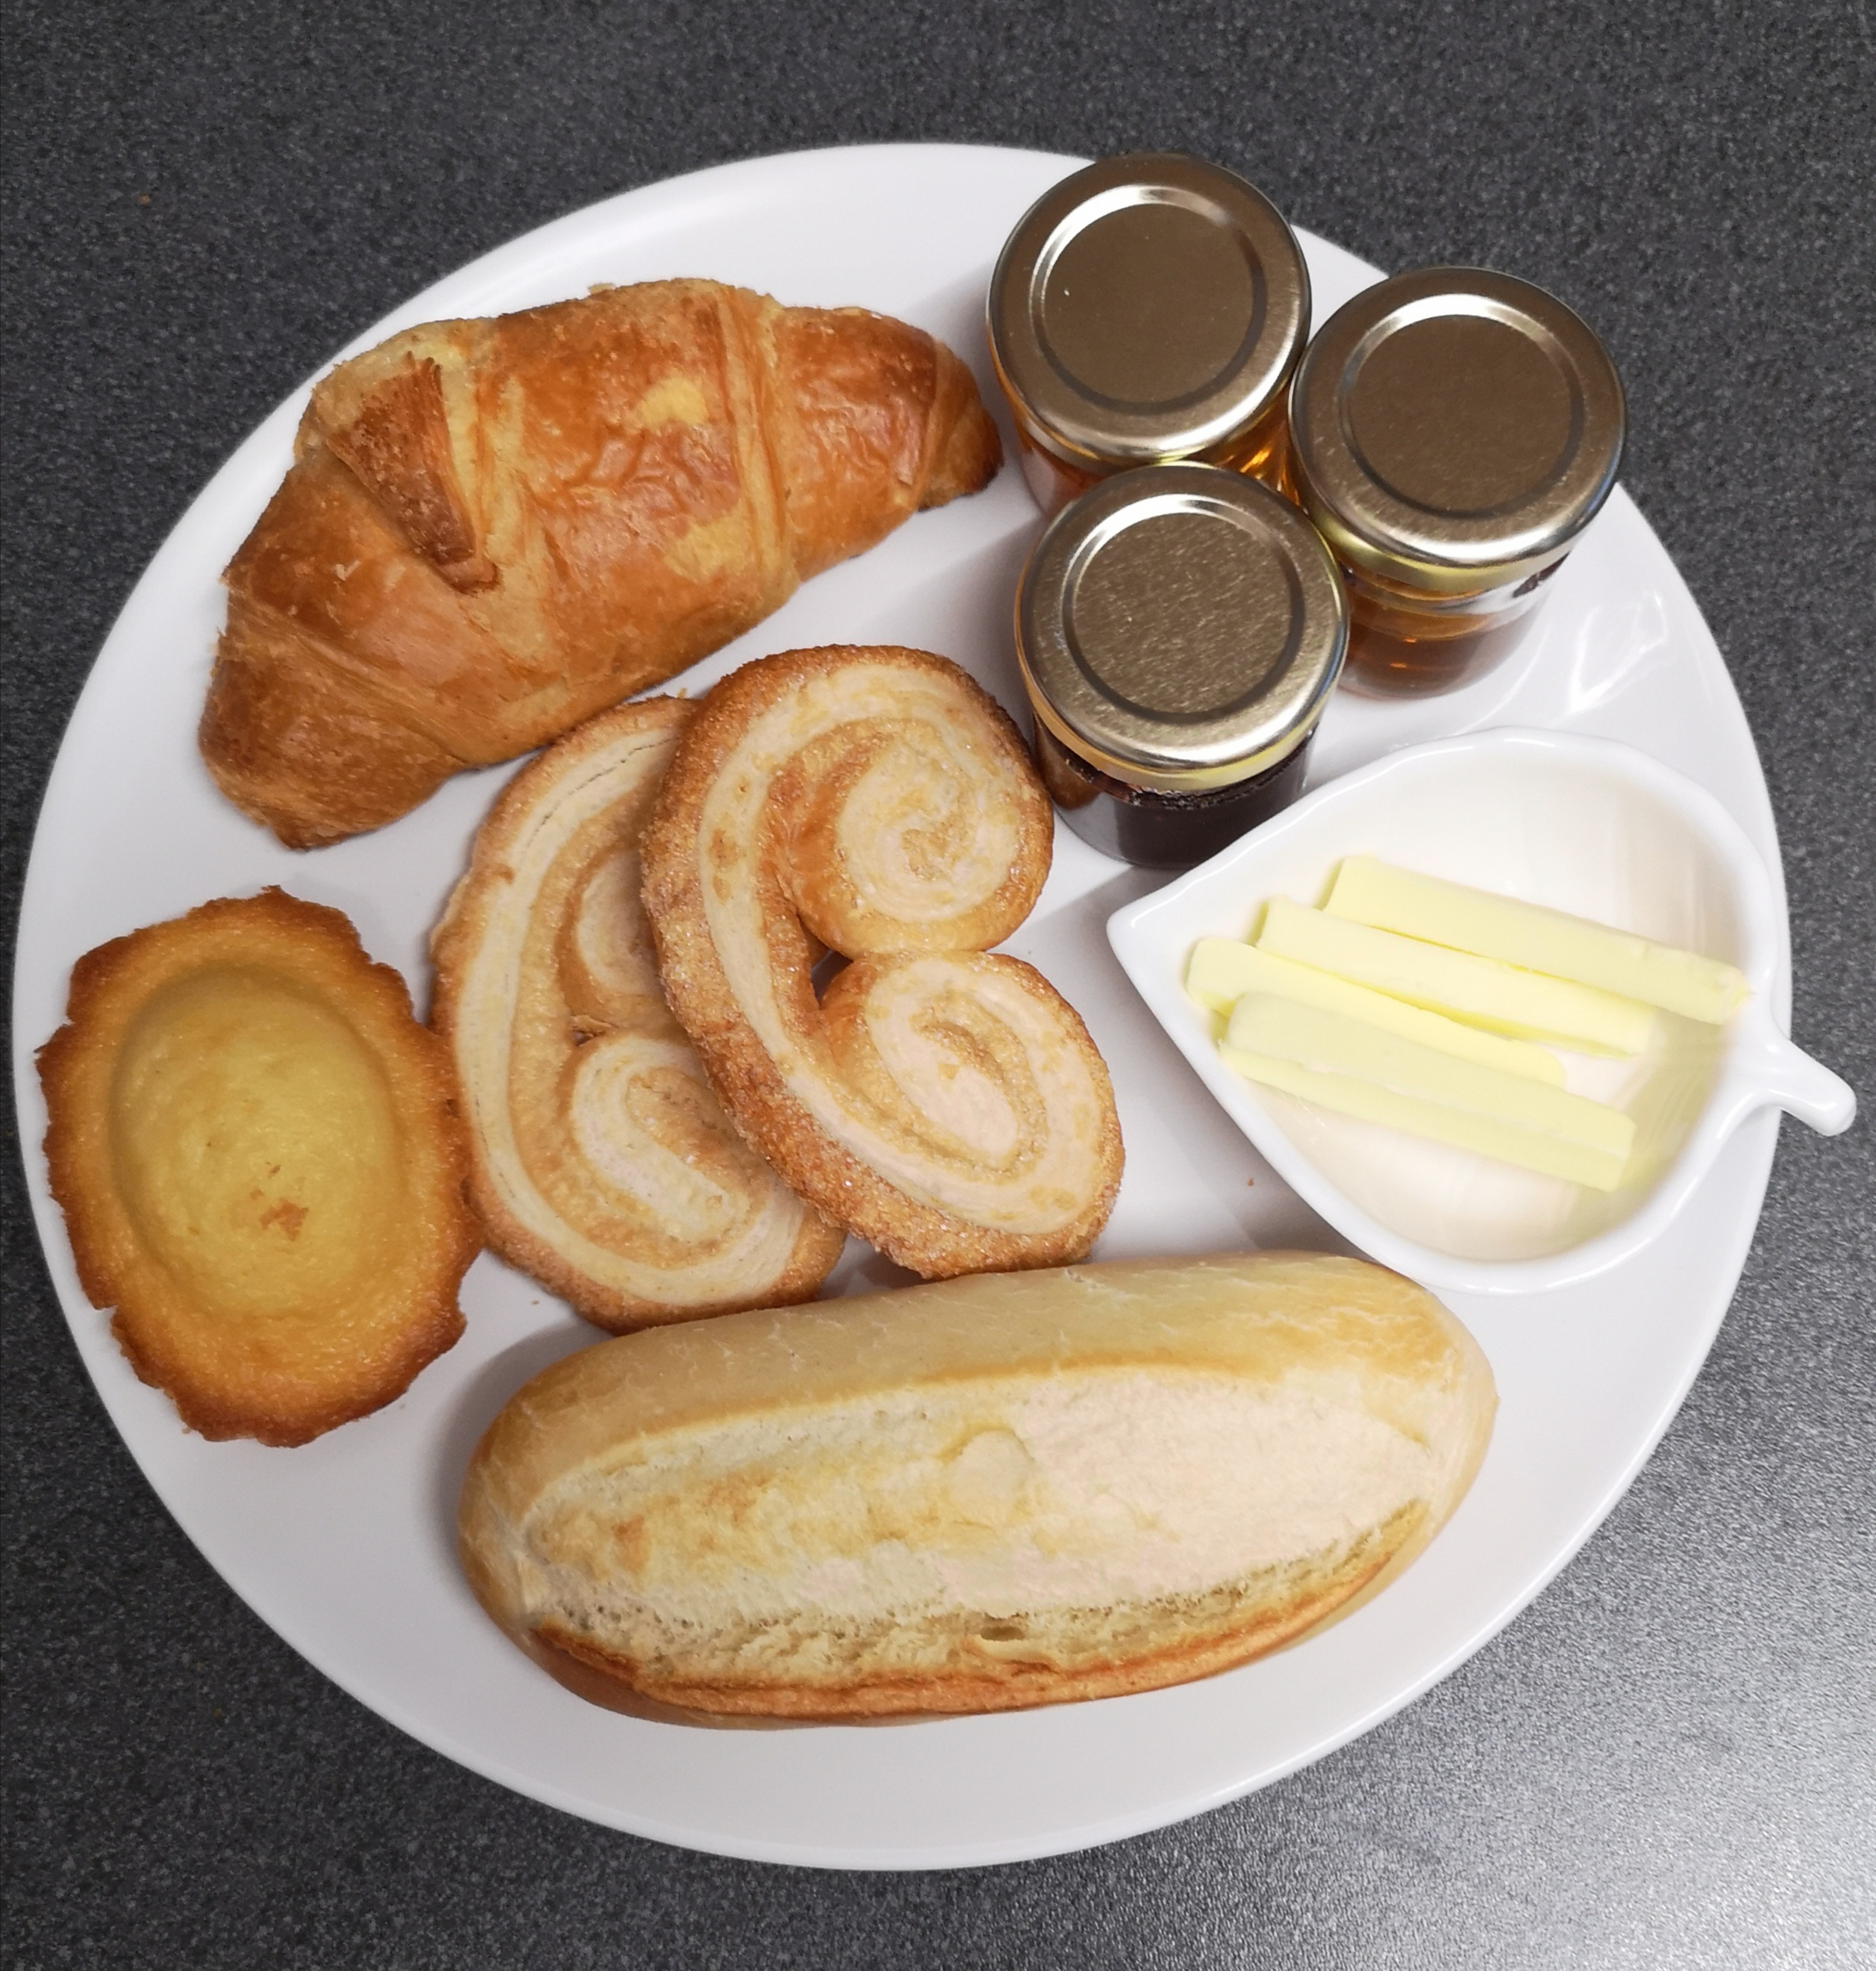 Continental breakfast option